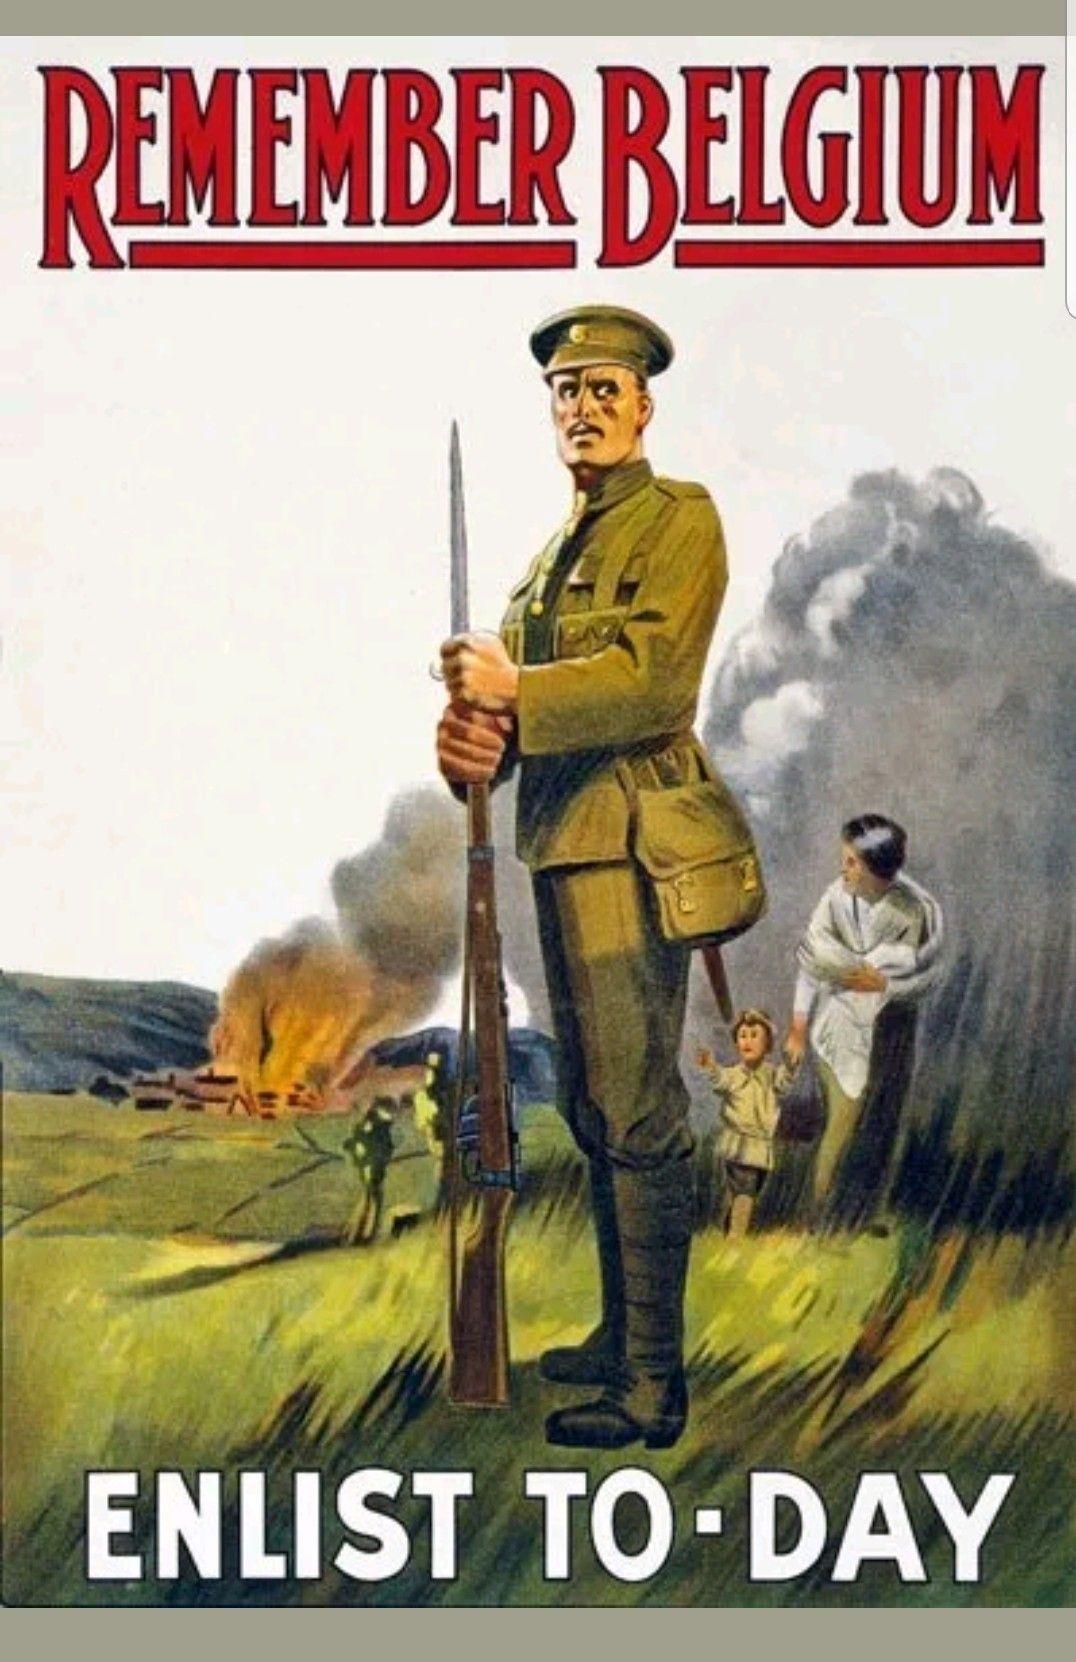 Pin by Brent Richardson on propaganda posters